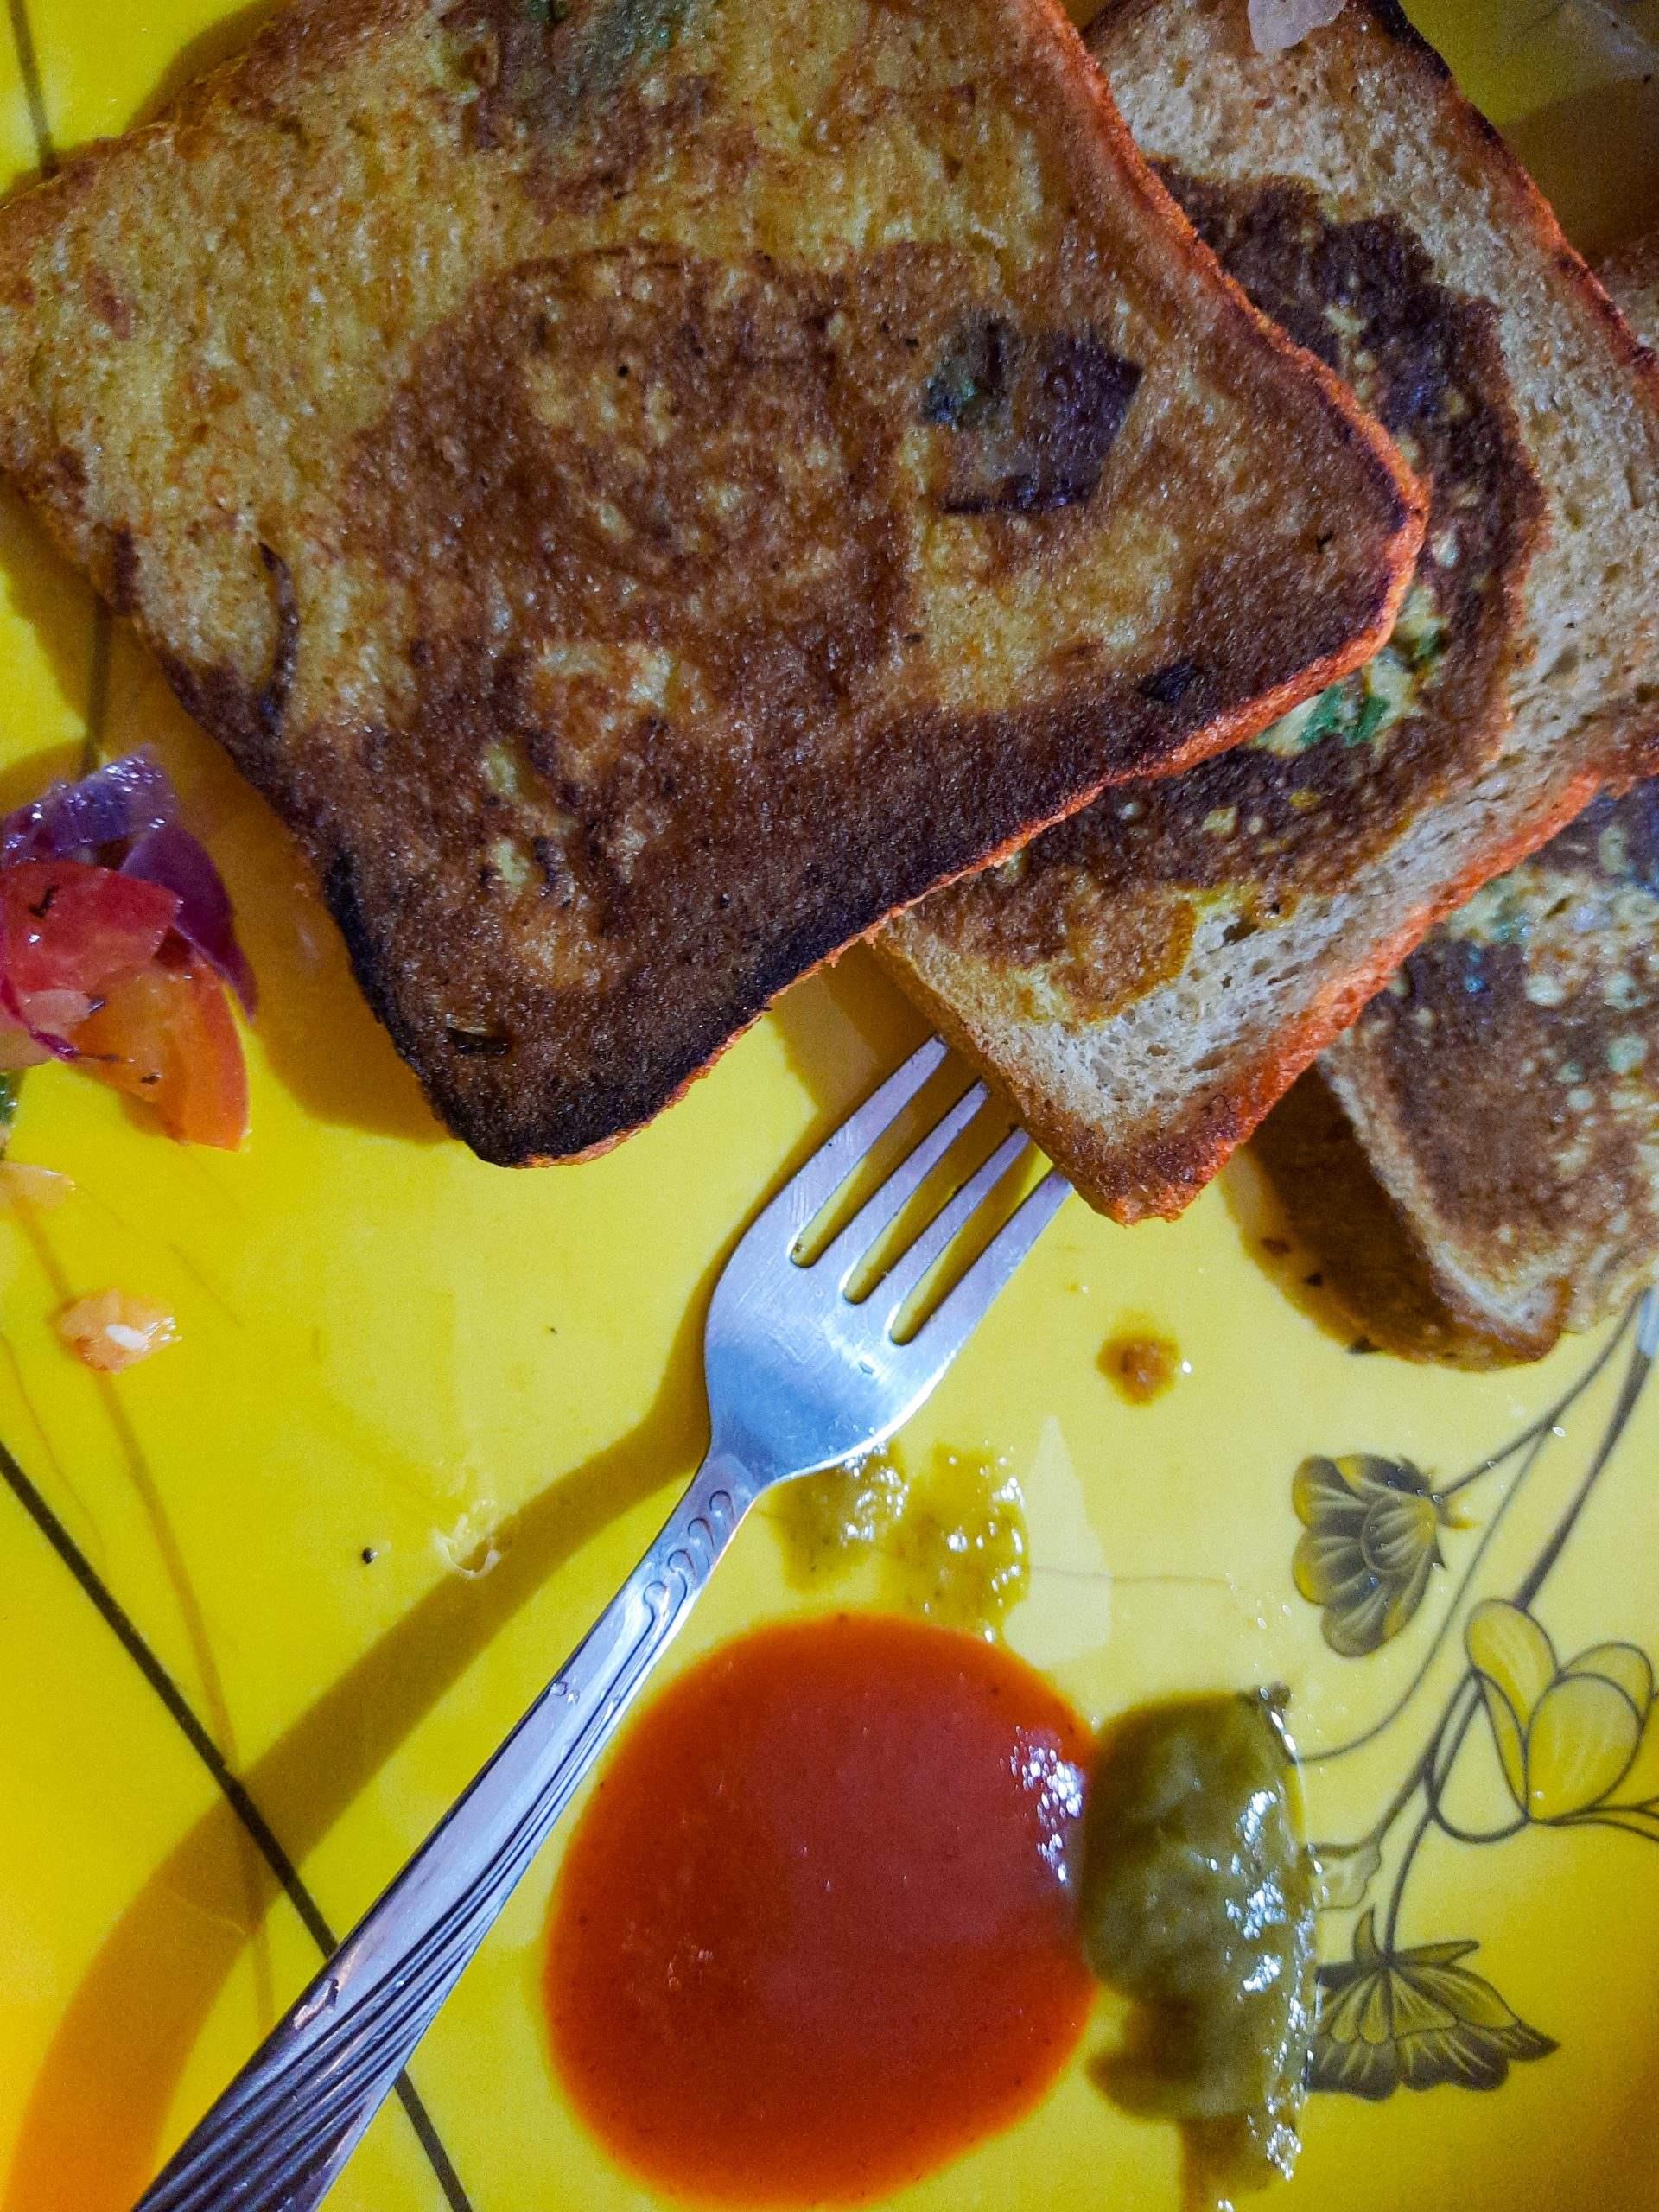 Homemade bread toast